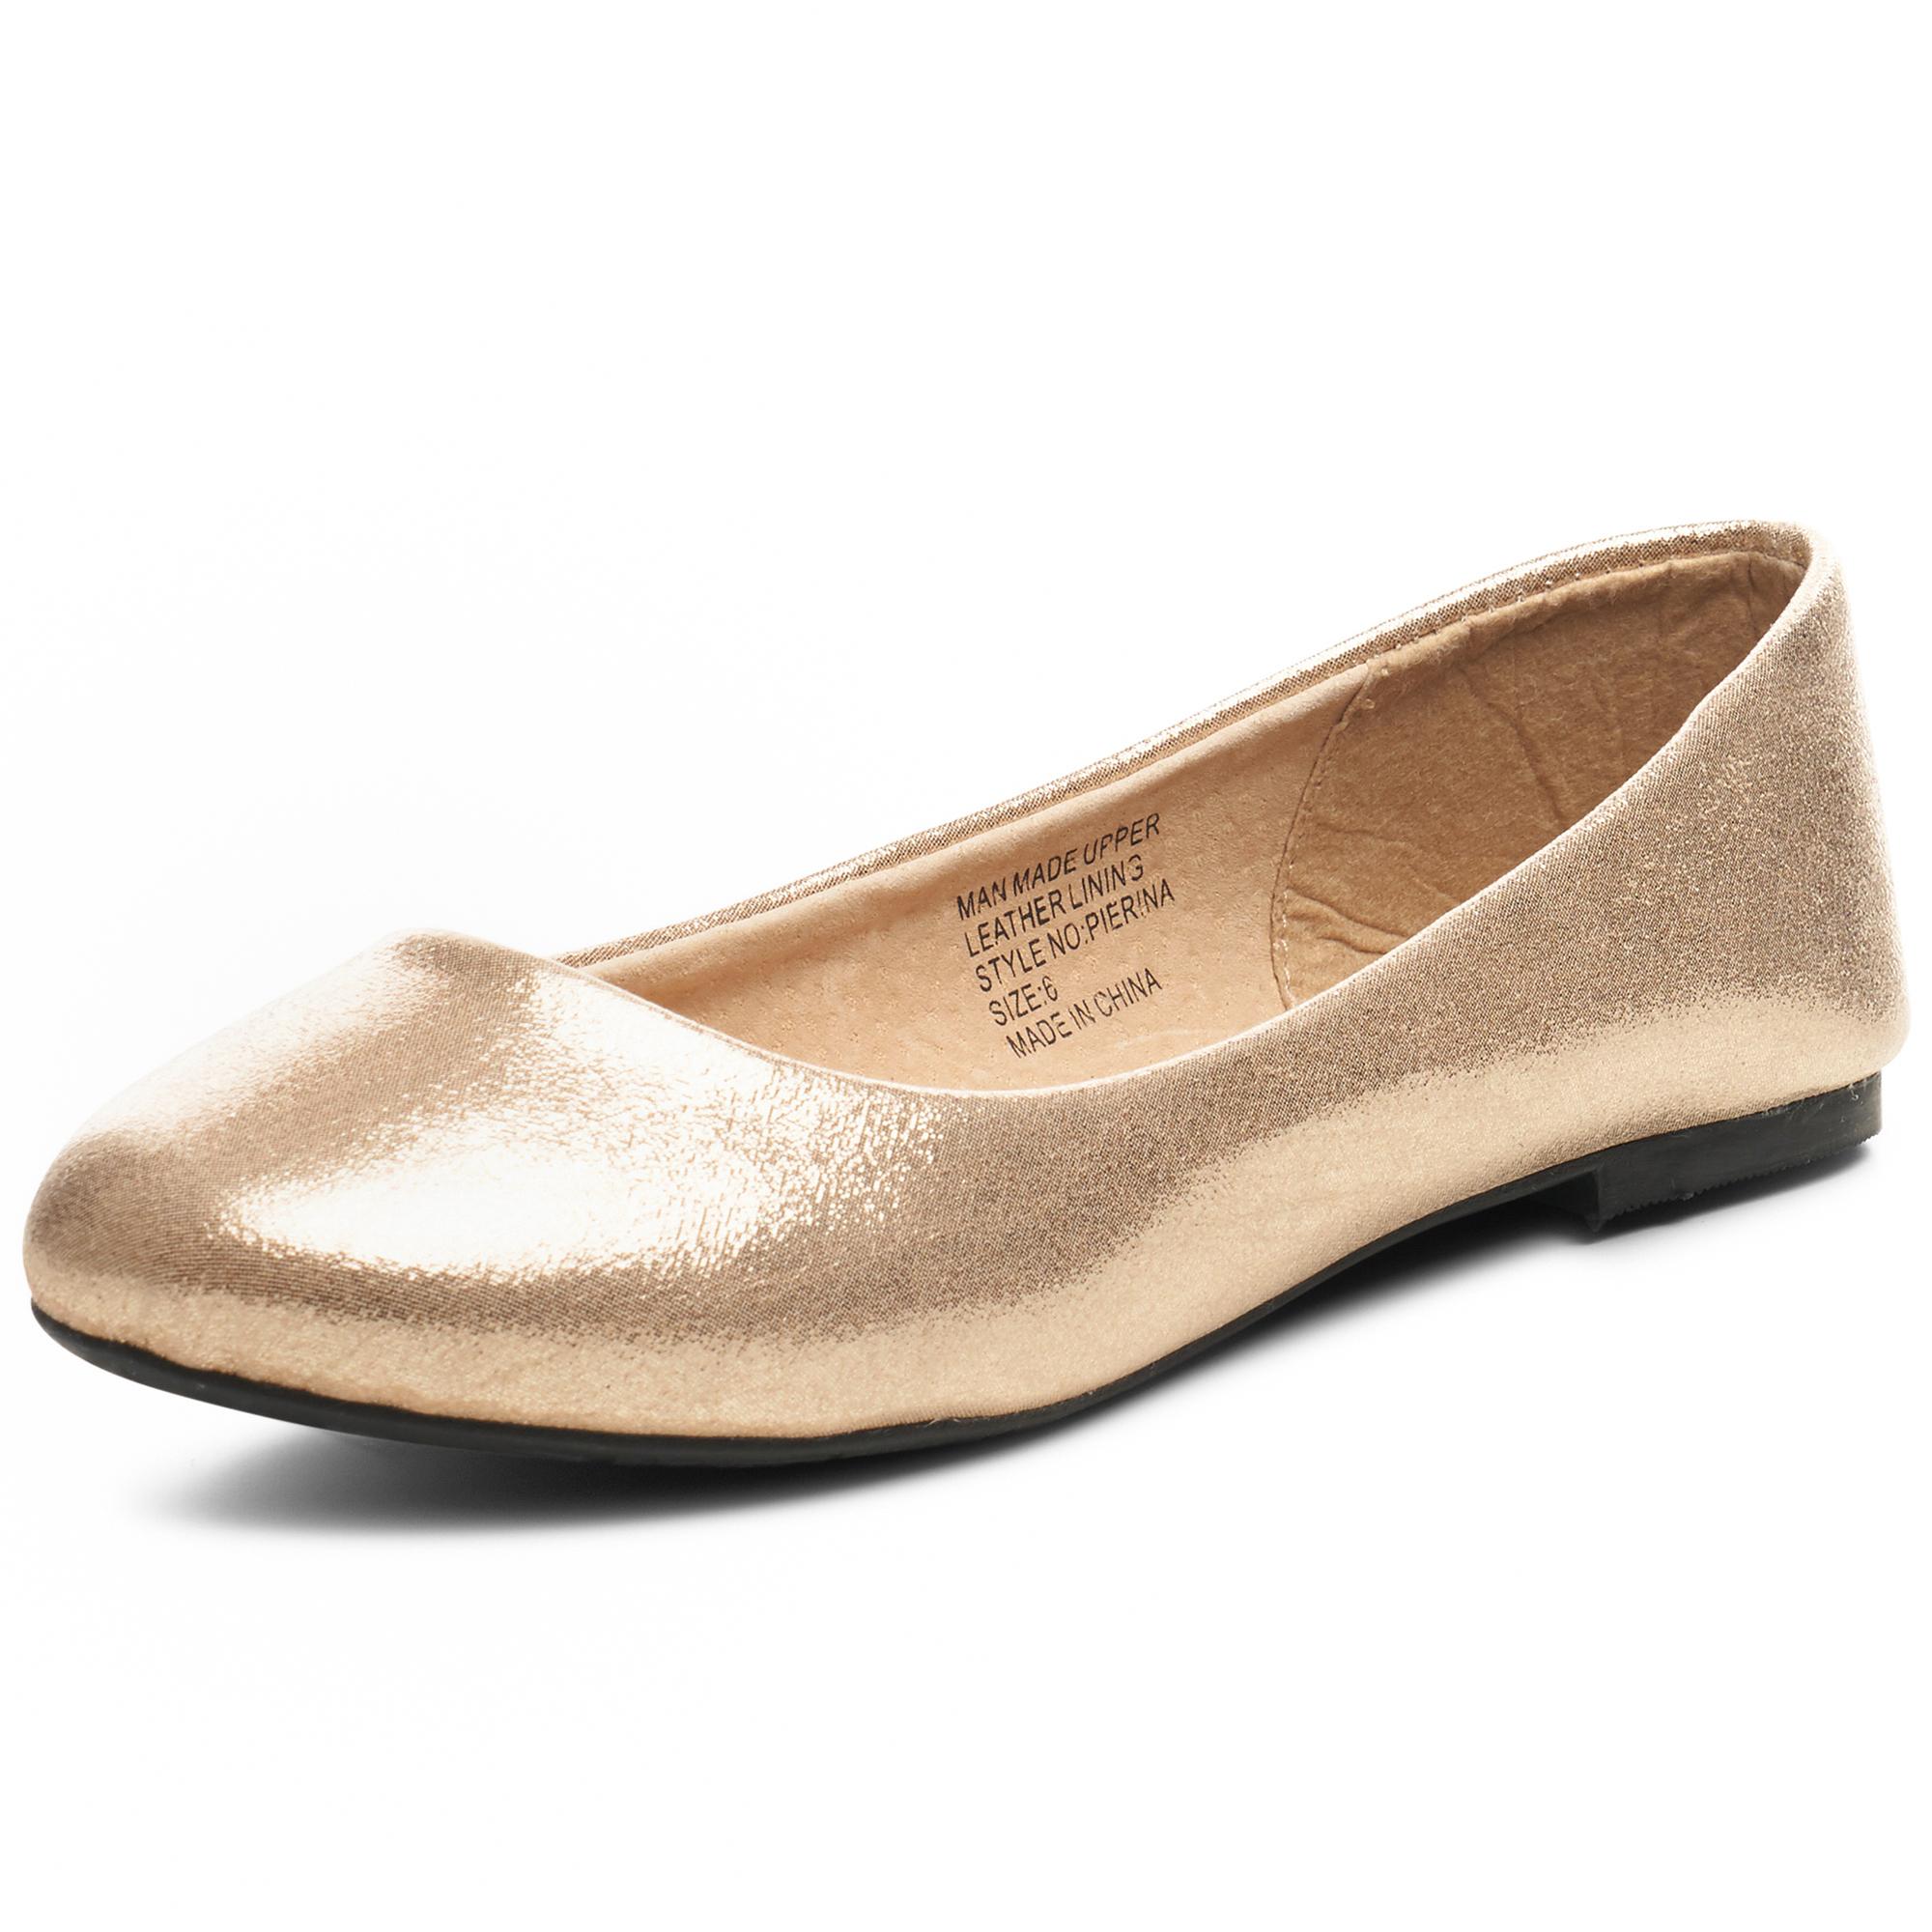 Alpine-Swiss-Pierina-Women-039-s-Ballet-Flats-Leather-Lined-Classic-Slip-On-Shoes